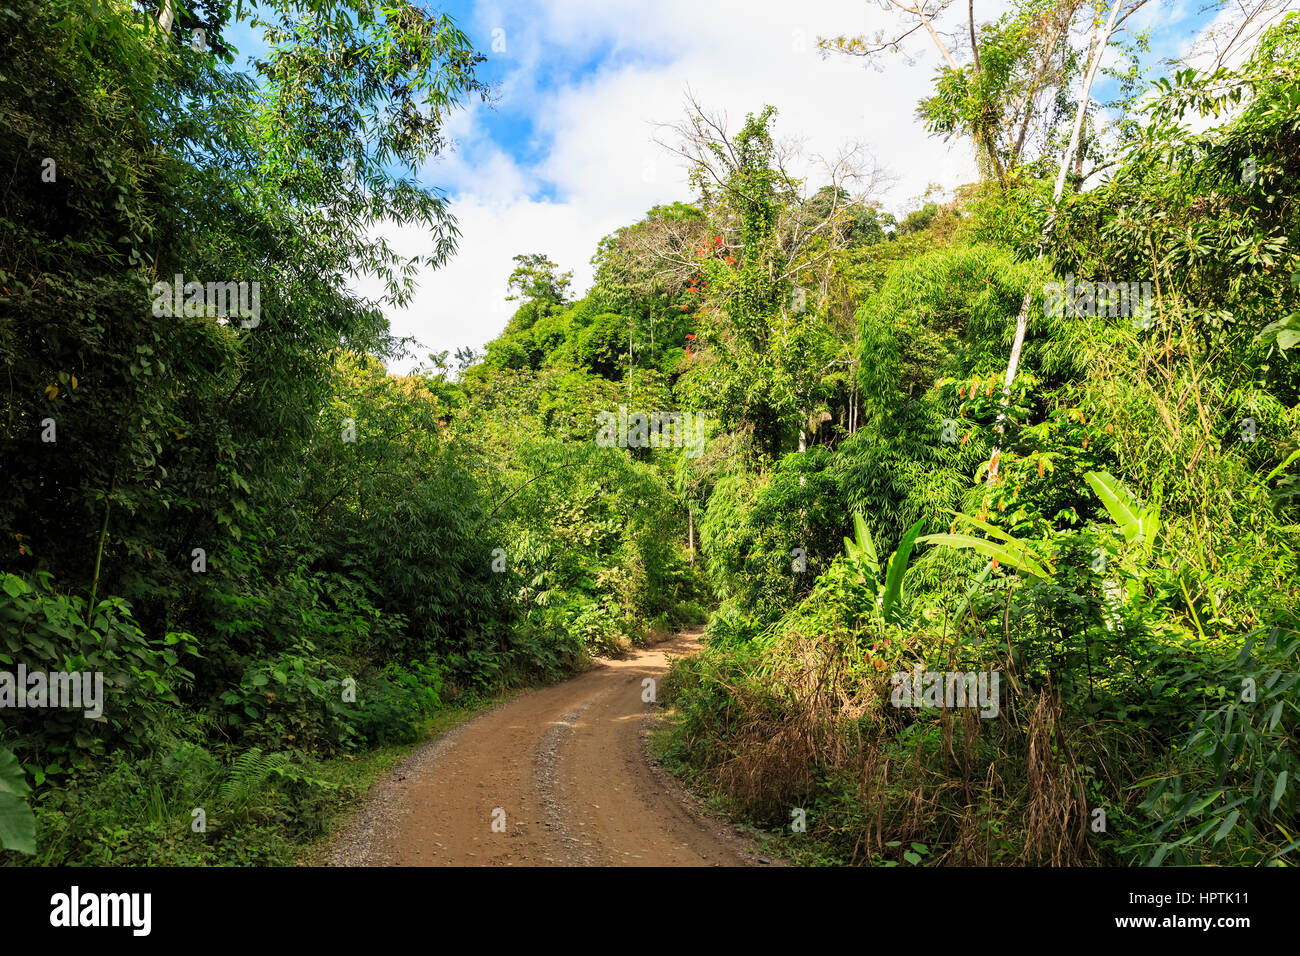 Peru, Amazon basin, piste through the forest - Stock Image